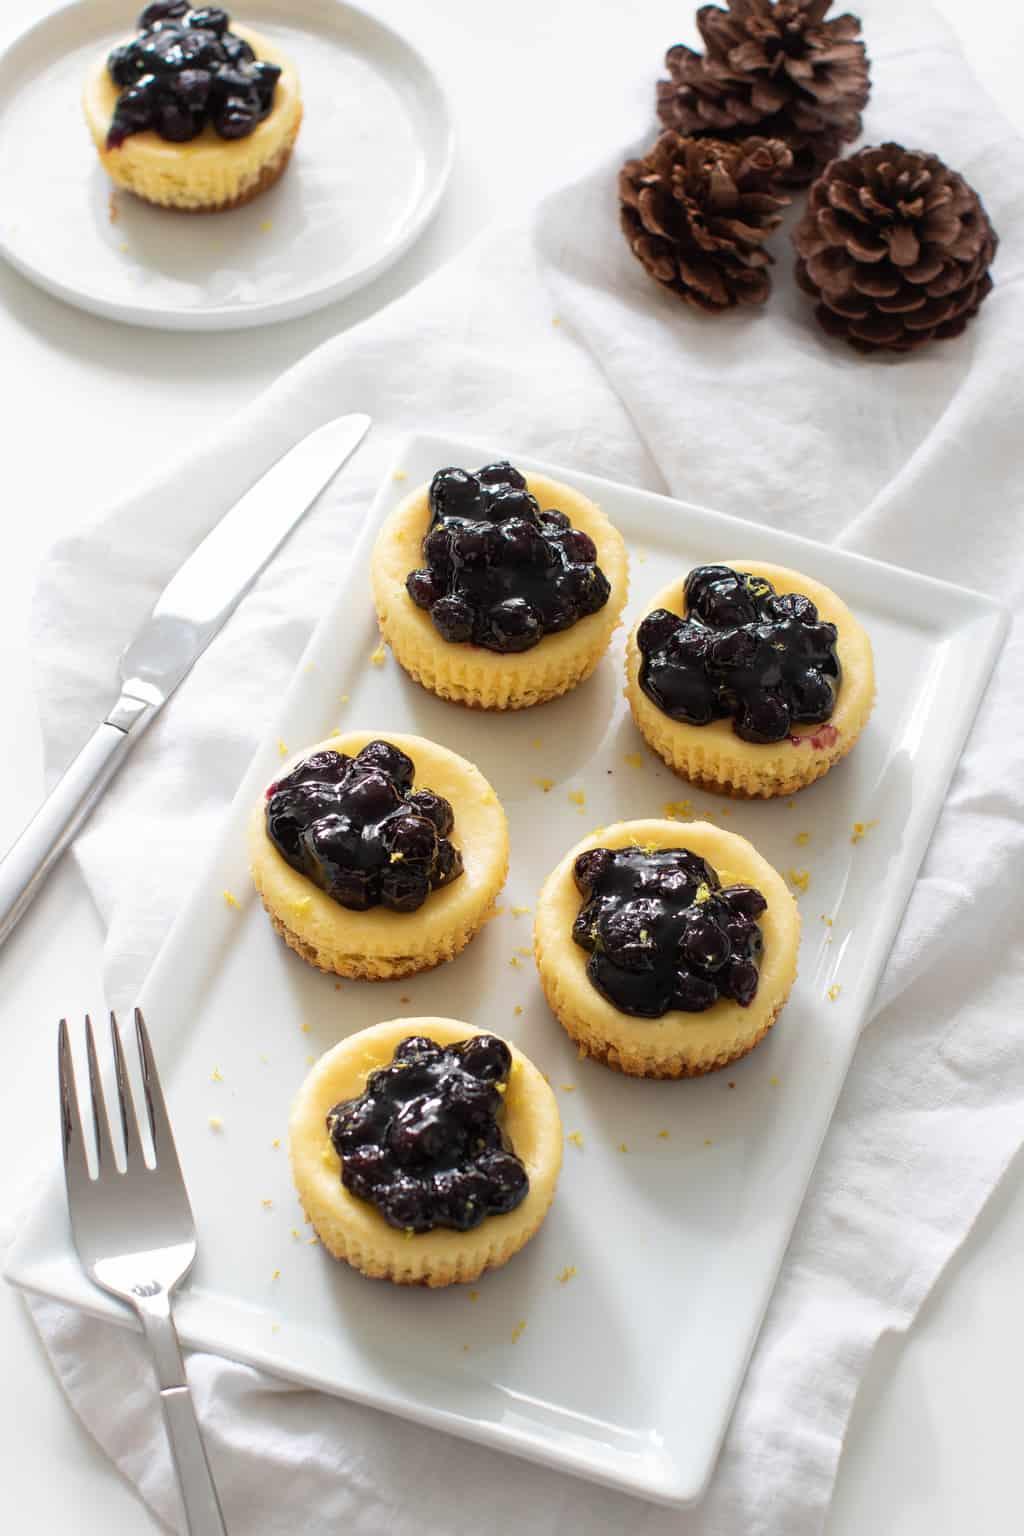 Lemon Cheesecake Bites w/ Blueberries